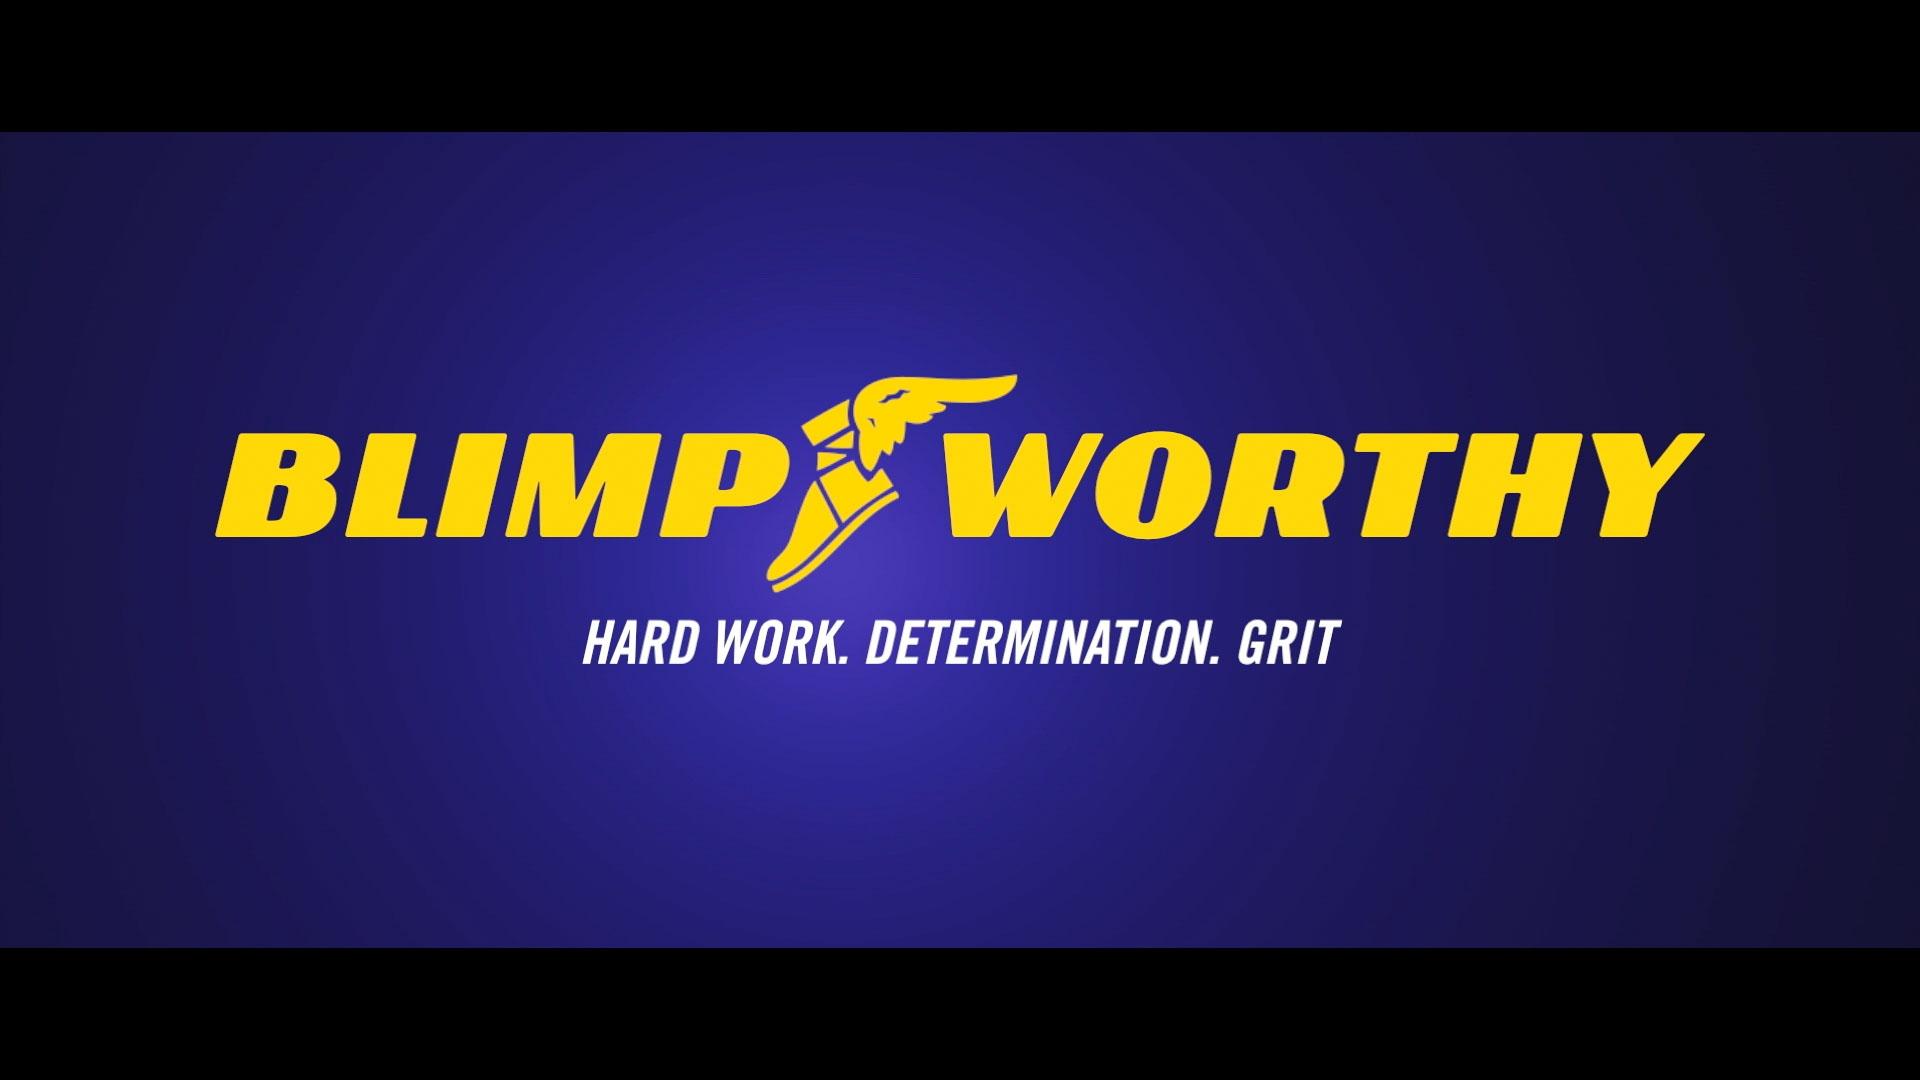 Blimpworthy13-13.jpg